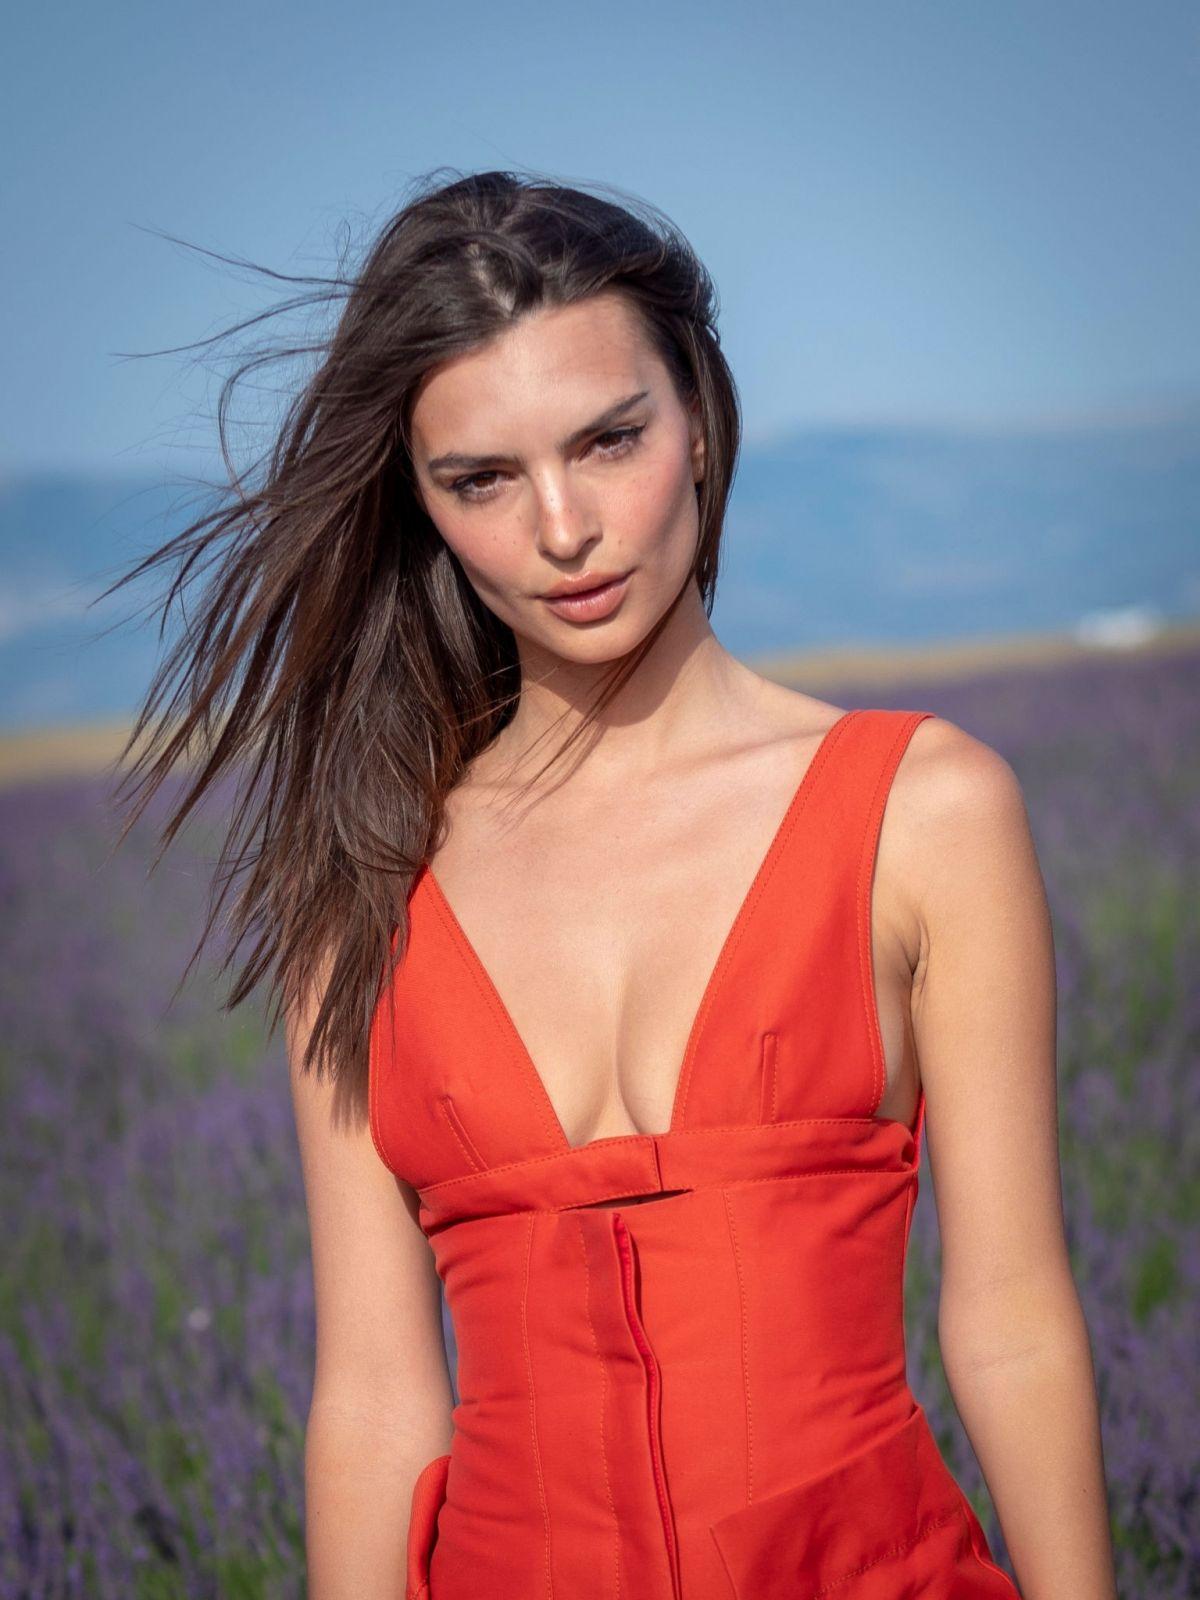 EMILY RATAJKOWSKI at Jacquemus Spring/Summer 2020 Fashion Show in Valensole 06/24/2019 - HawtCelebs